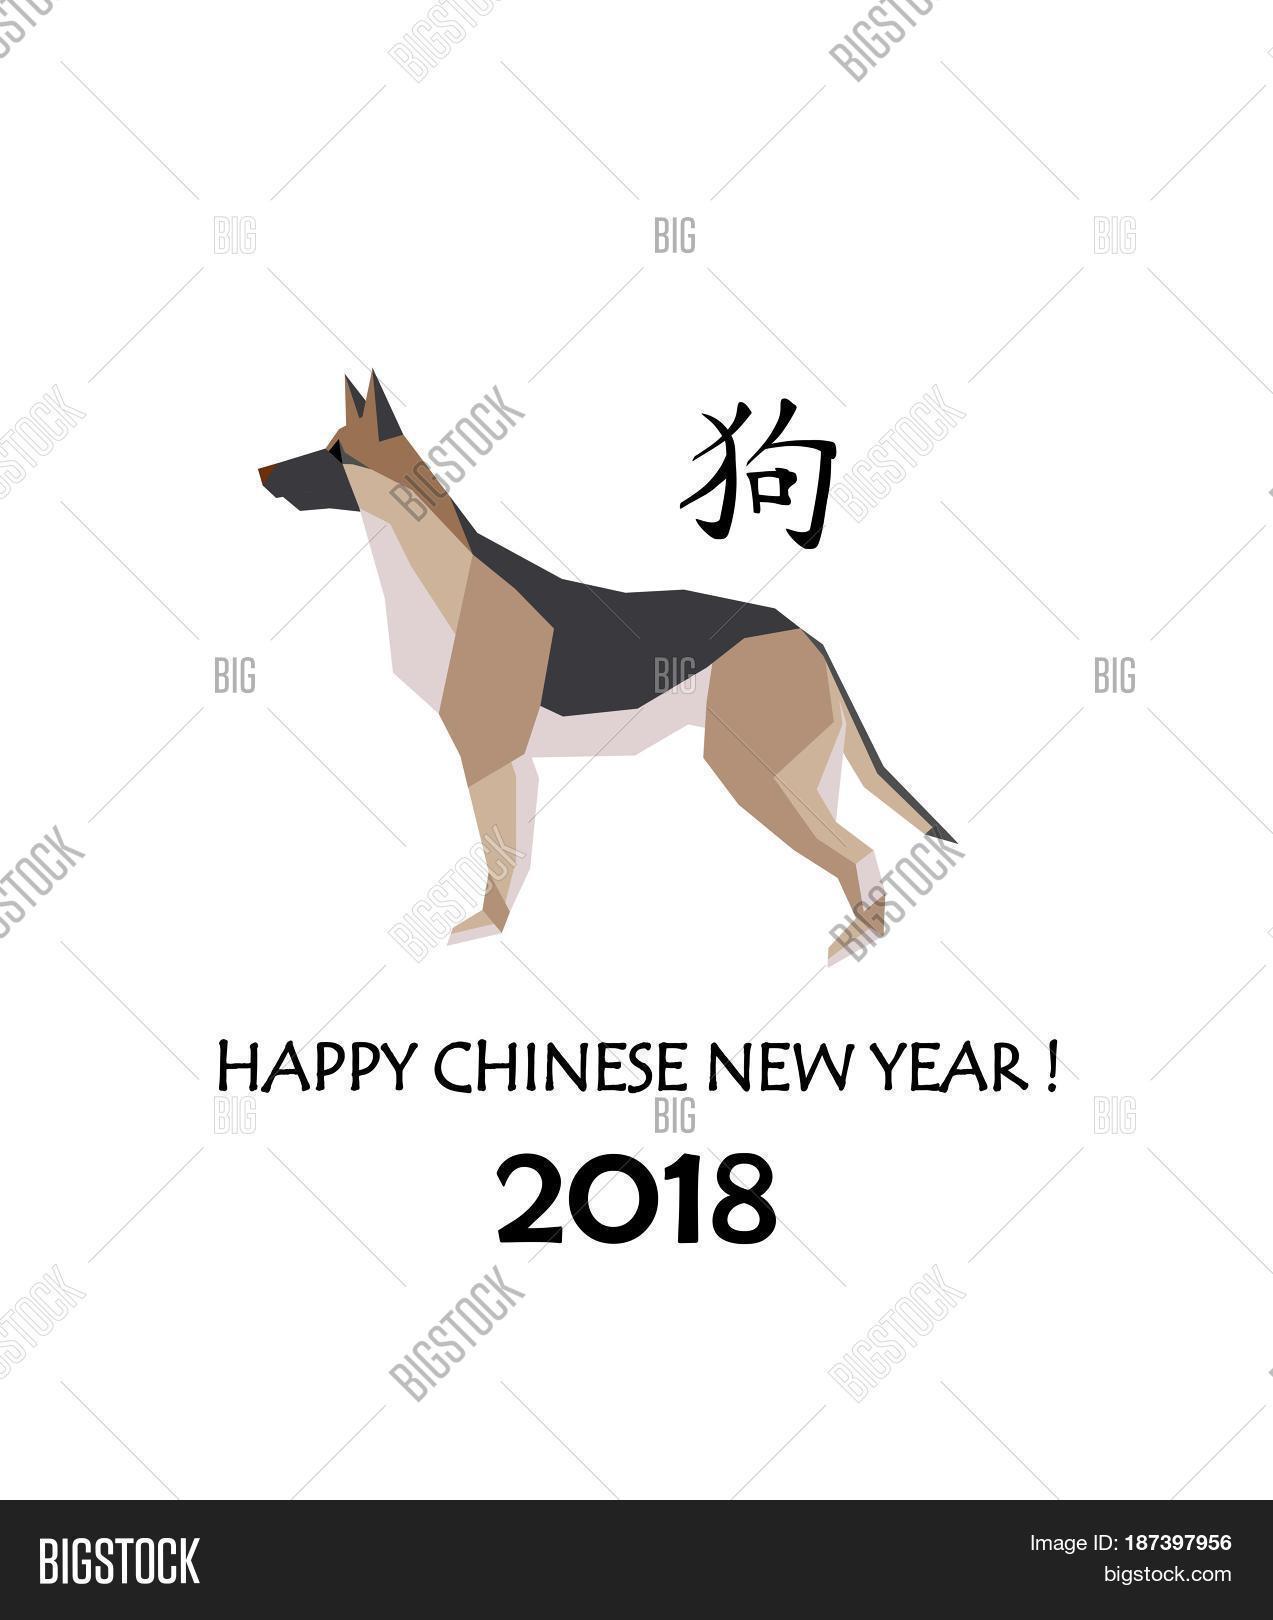 Greeting Card Chinese Image Photo Free Trial Bigstock